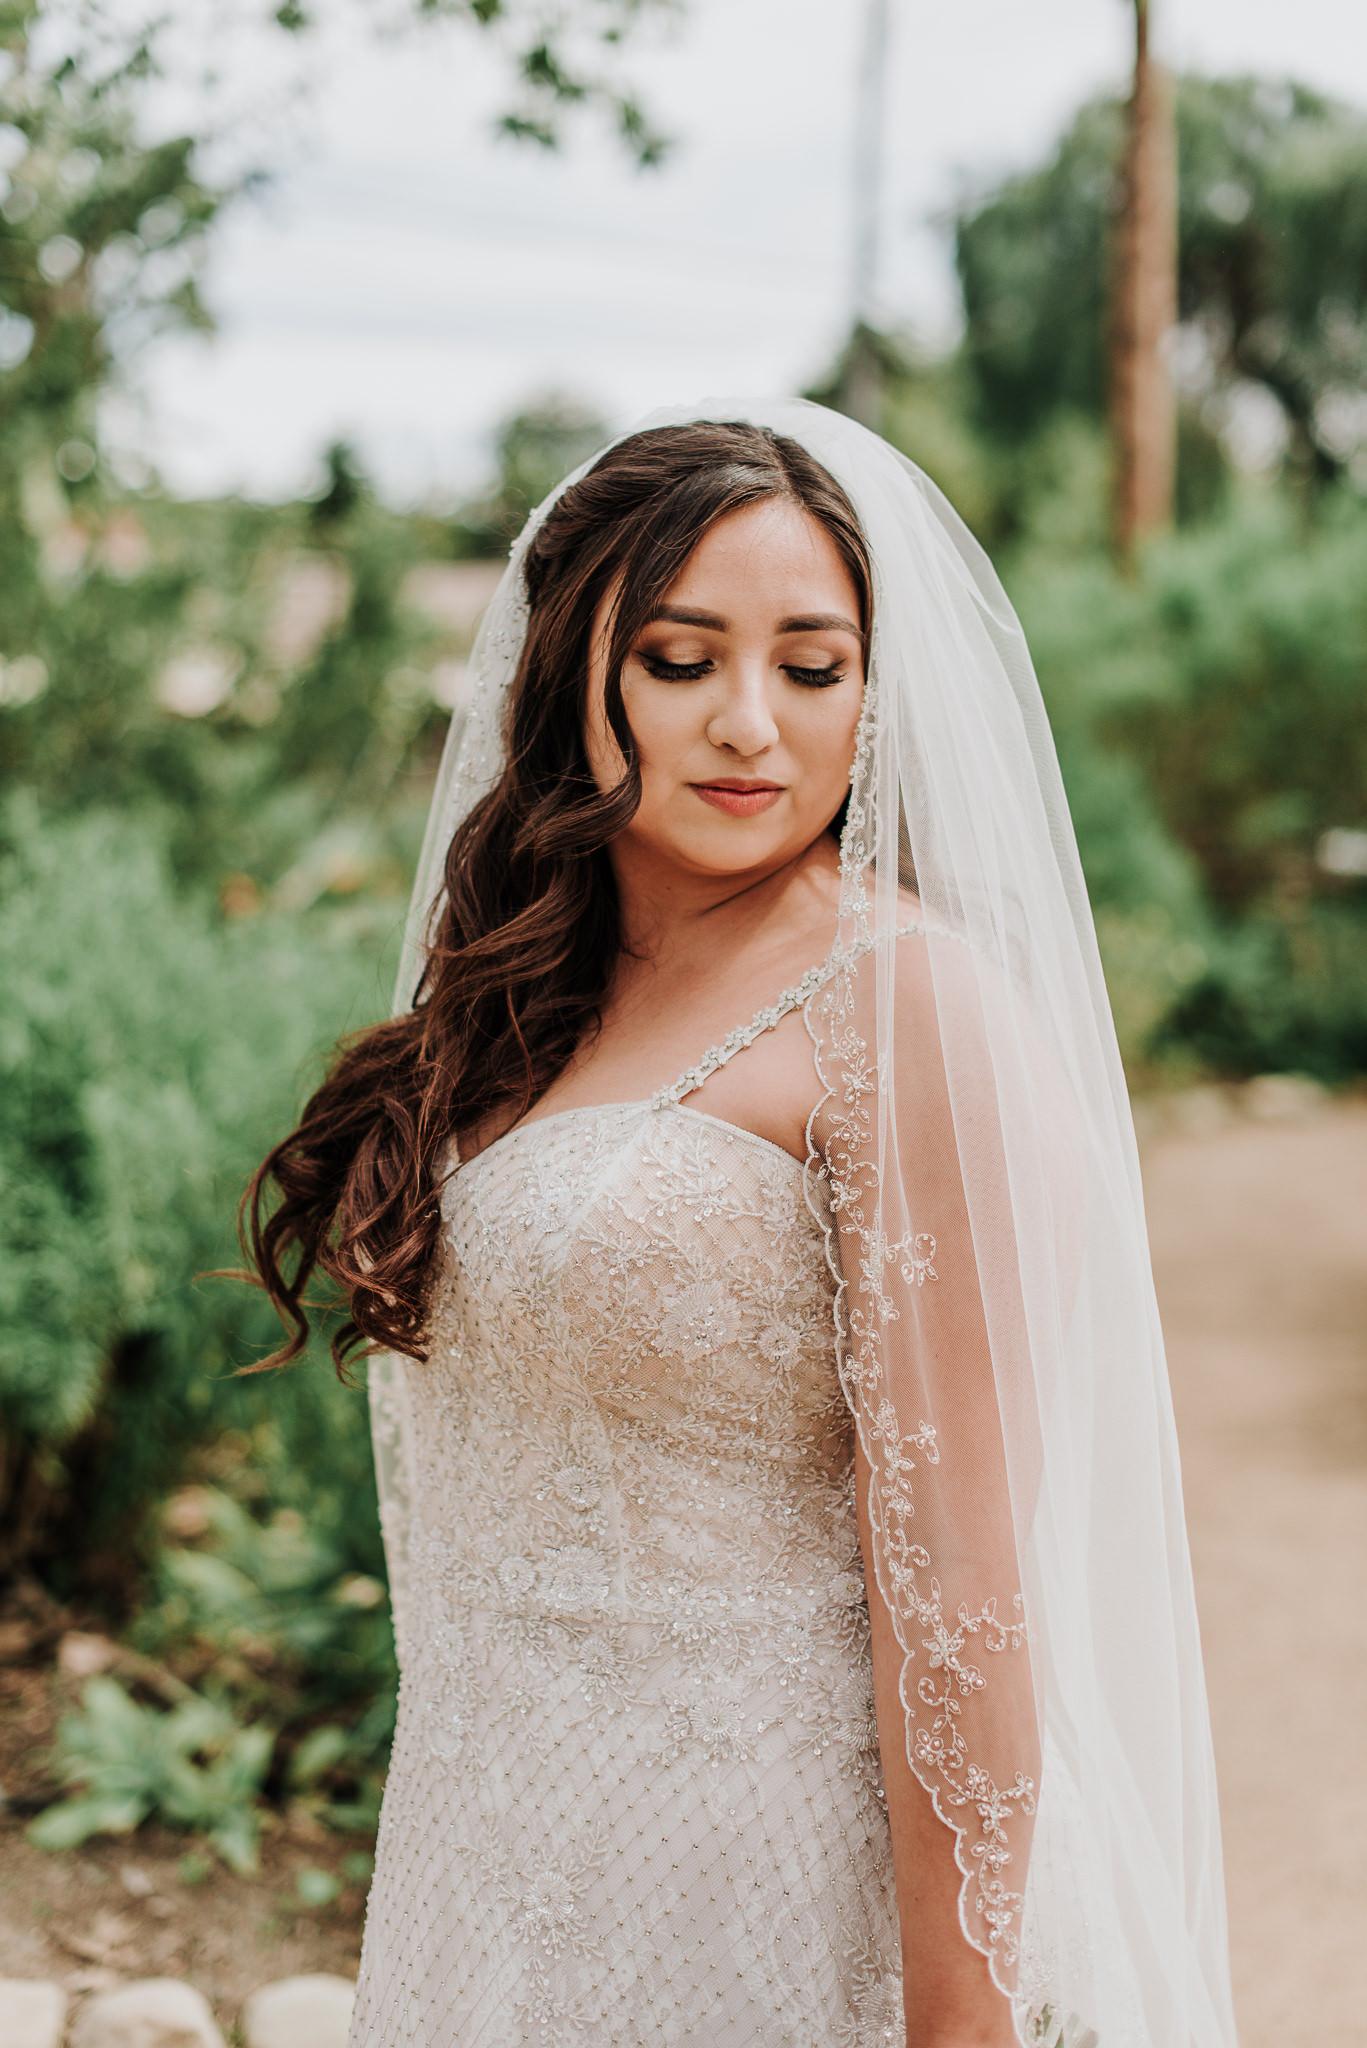 2019-04-05_Brittany_and_Nick_-_Married_-_San_Juan_Capistrano-42.jpg